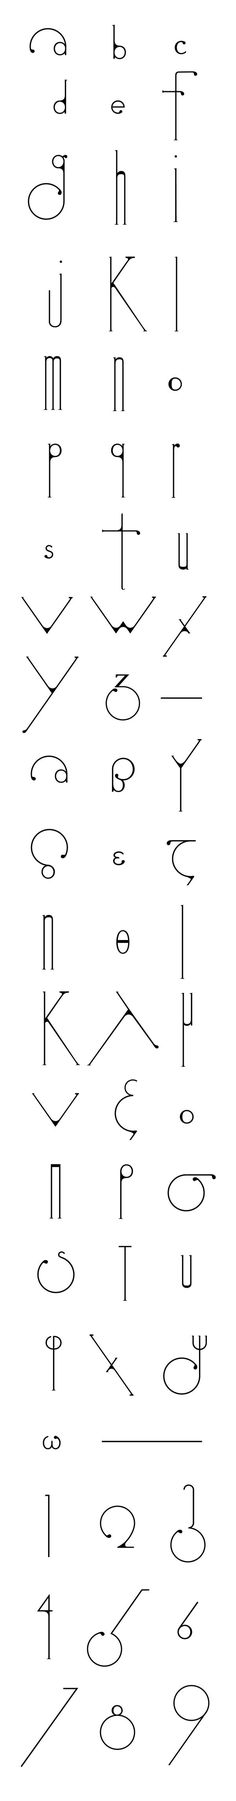 Futuracha font | lettering / typography | Pinterest